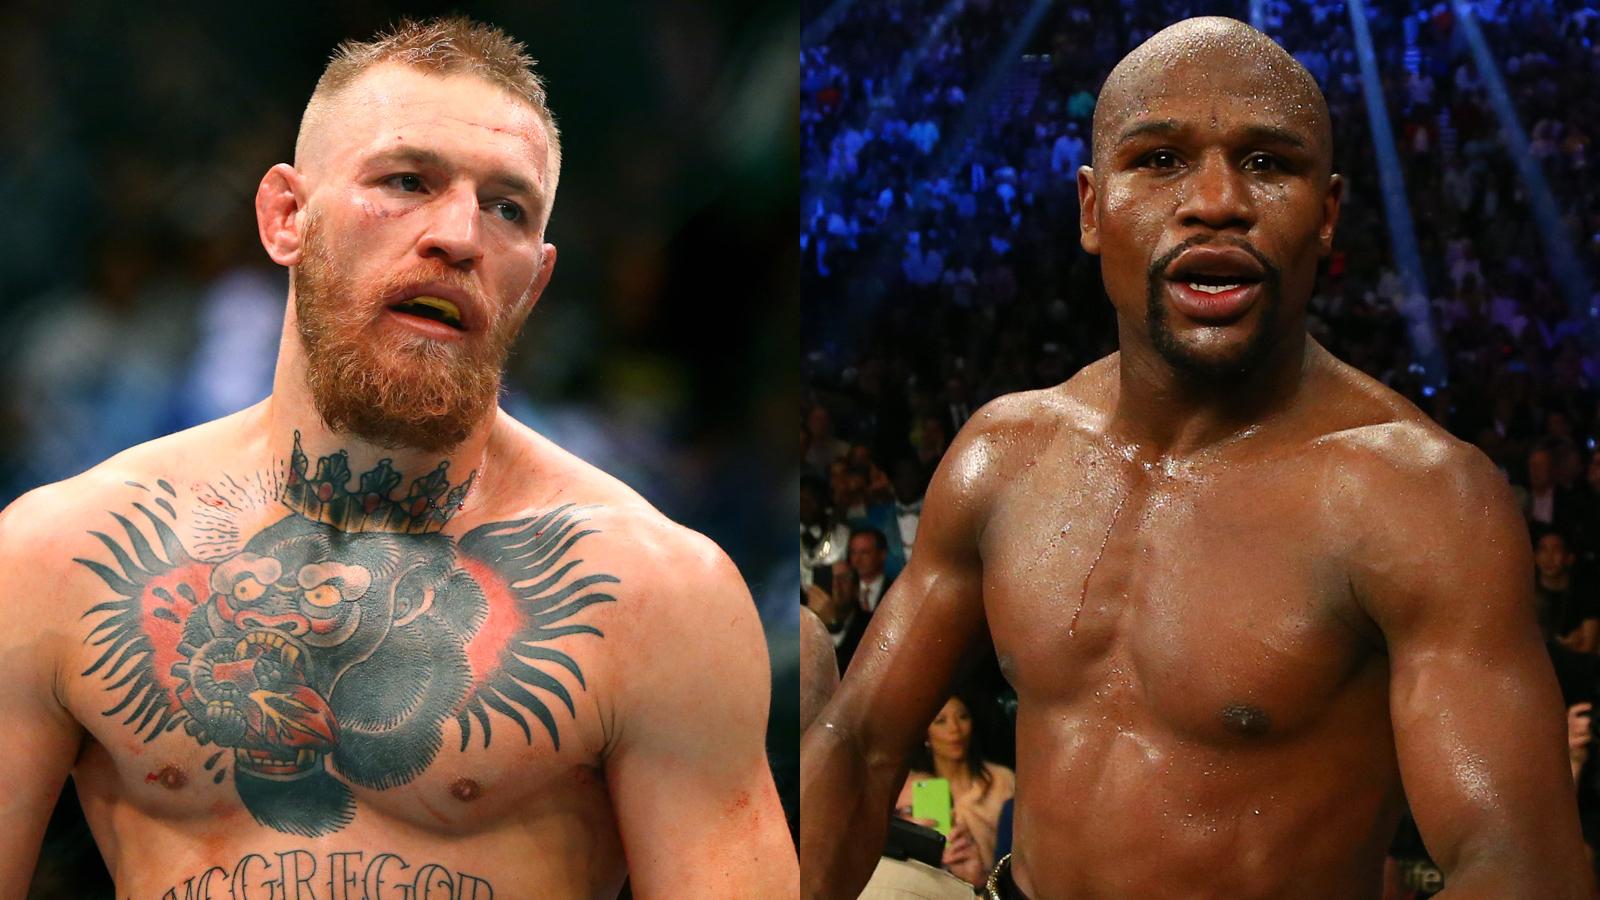 012017 UFC Conor McGregor Floyd Mayweather